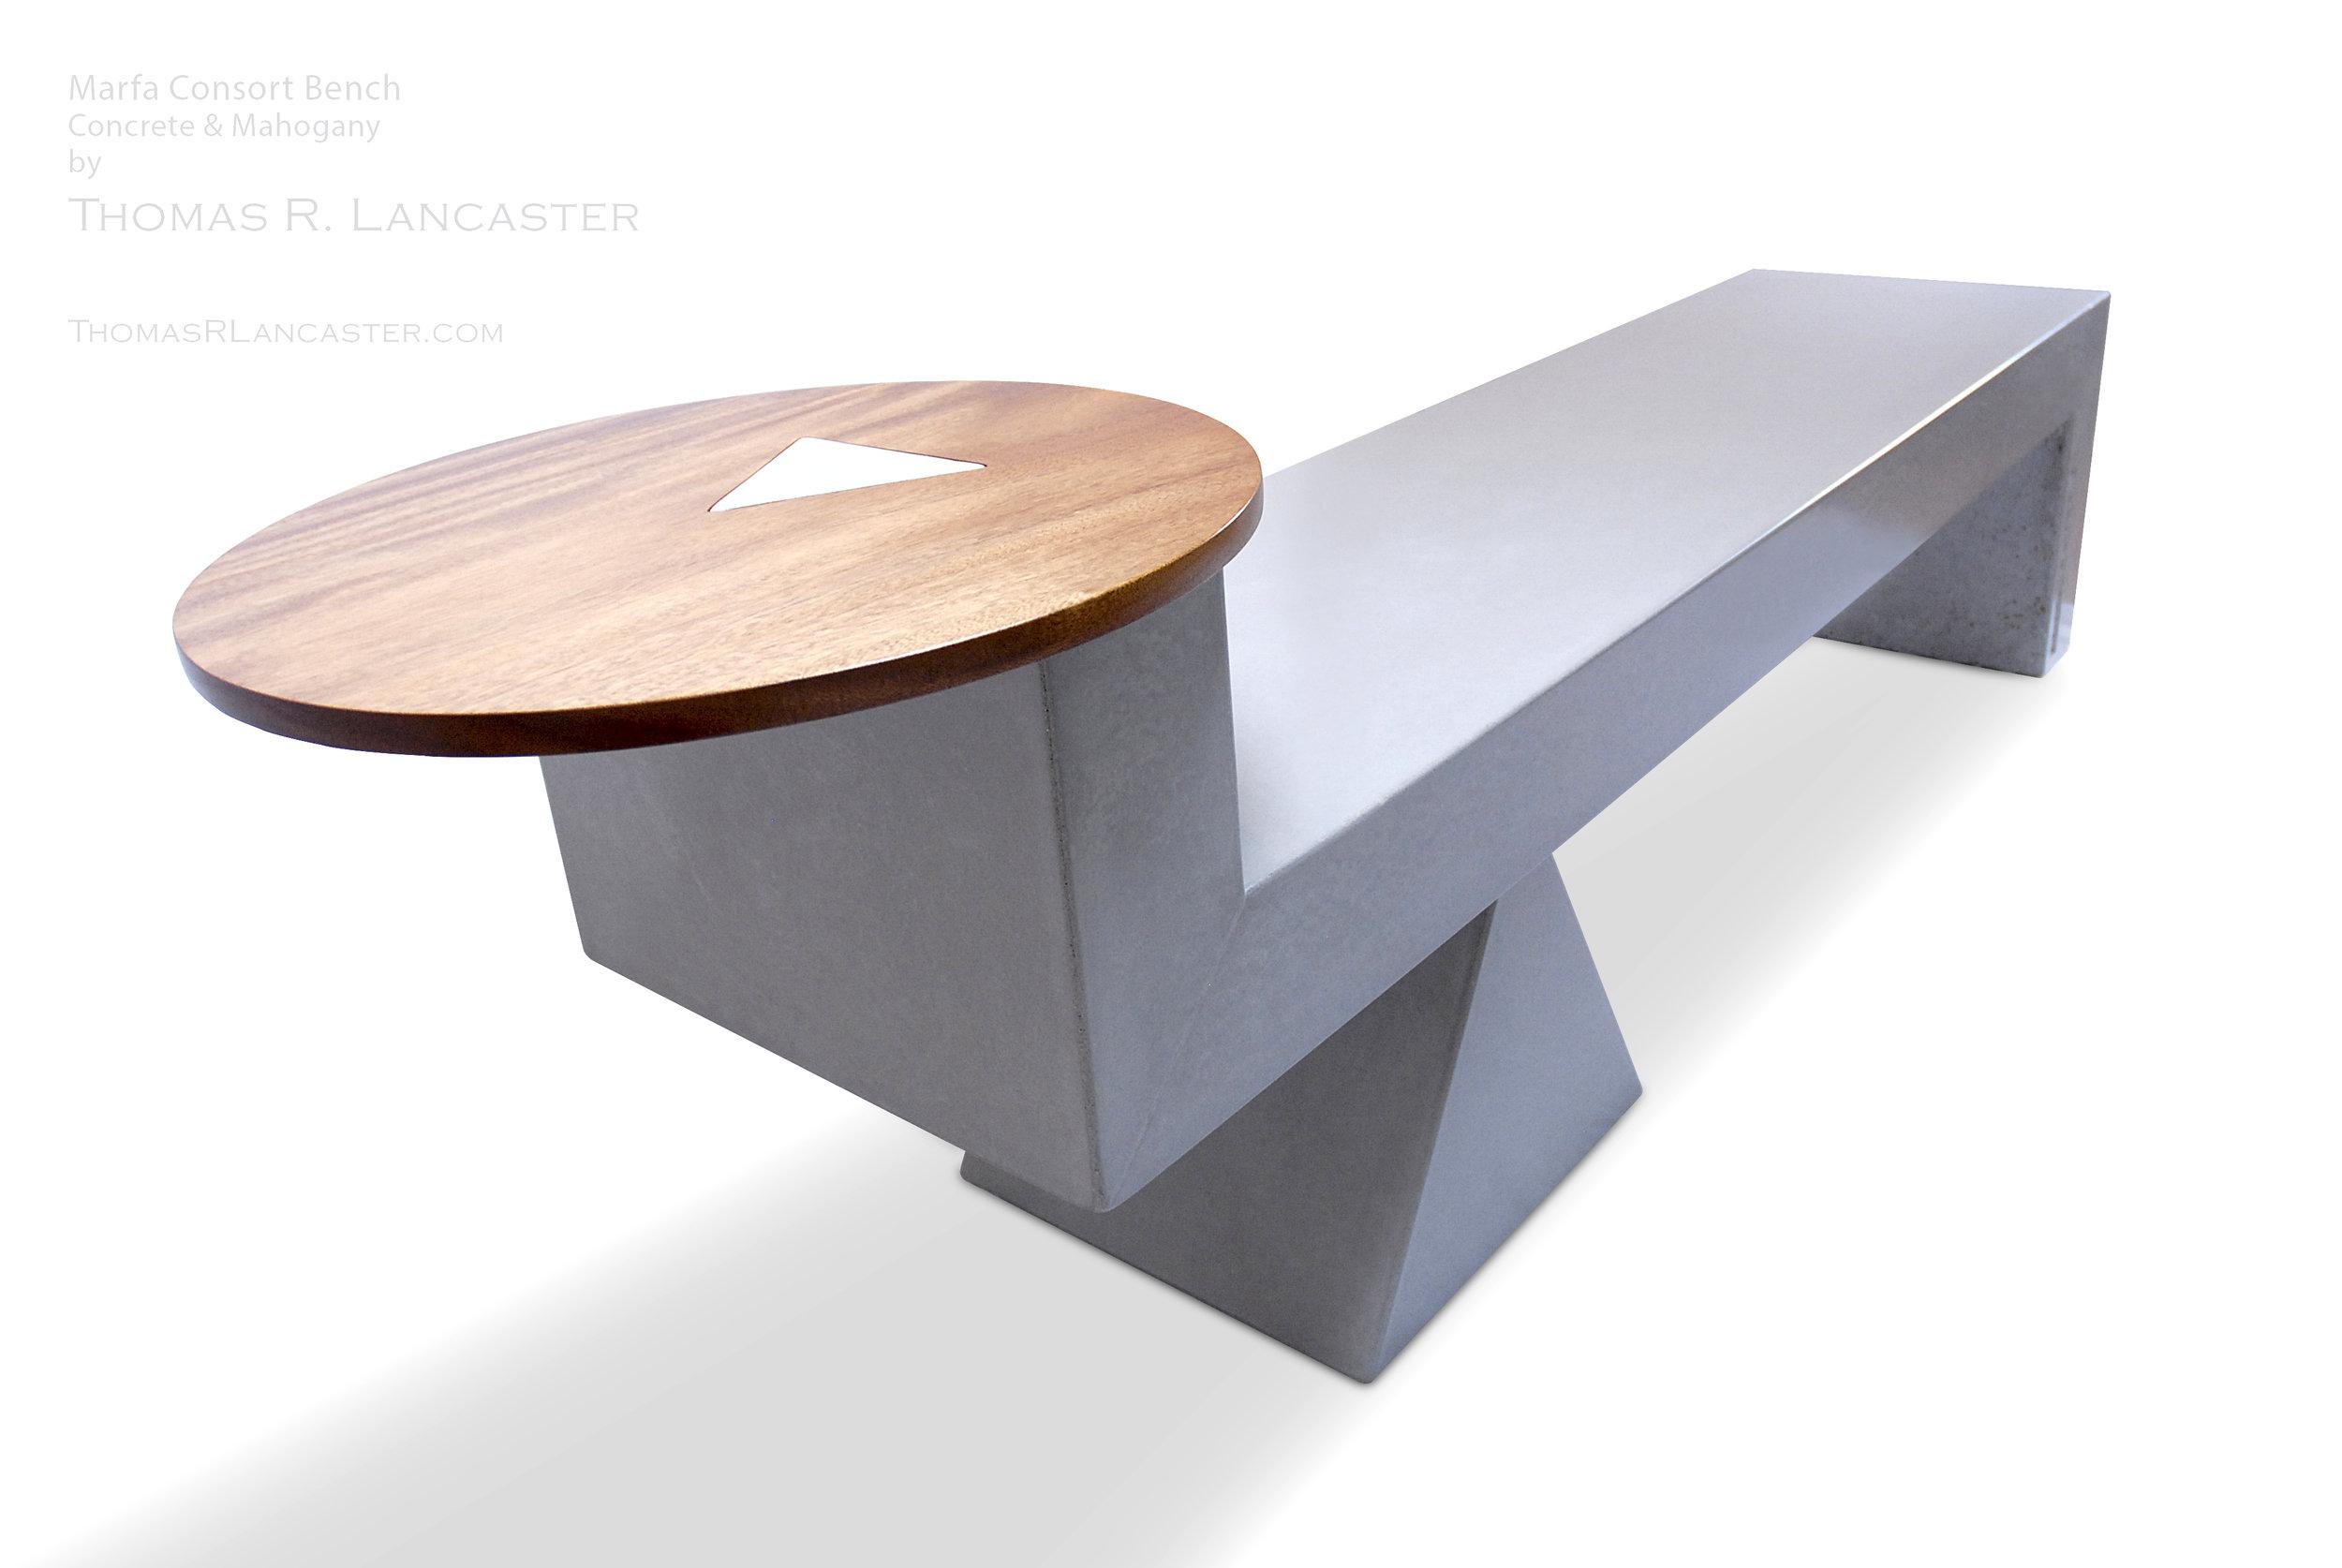 lancaster-concrete-mahogany-bench